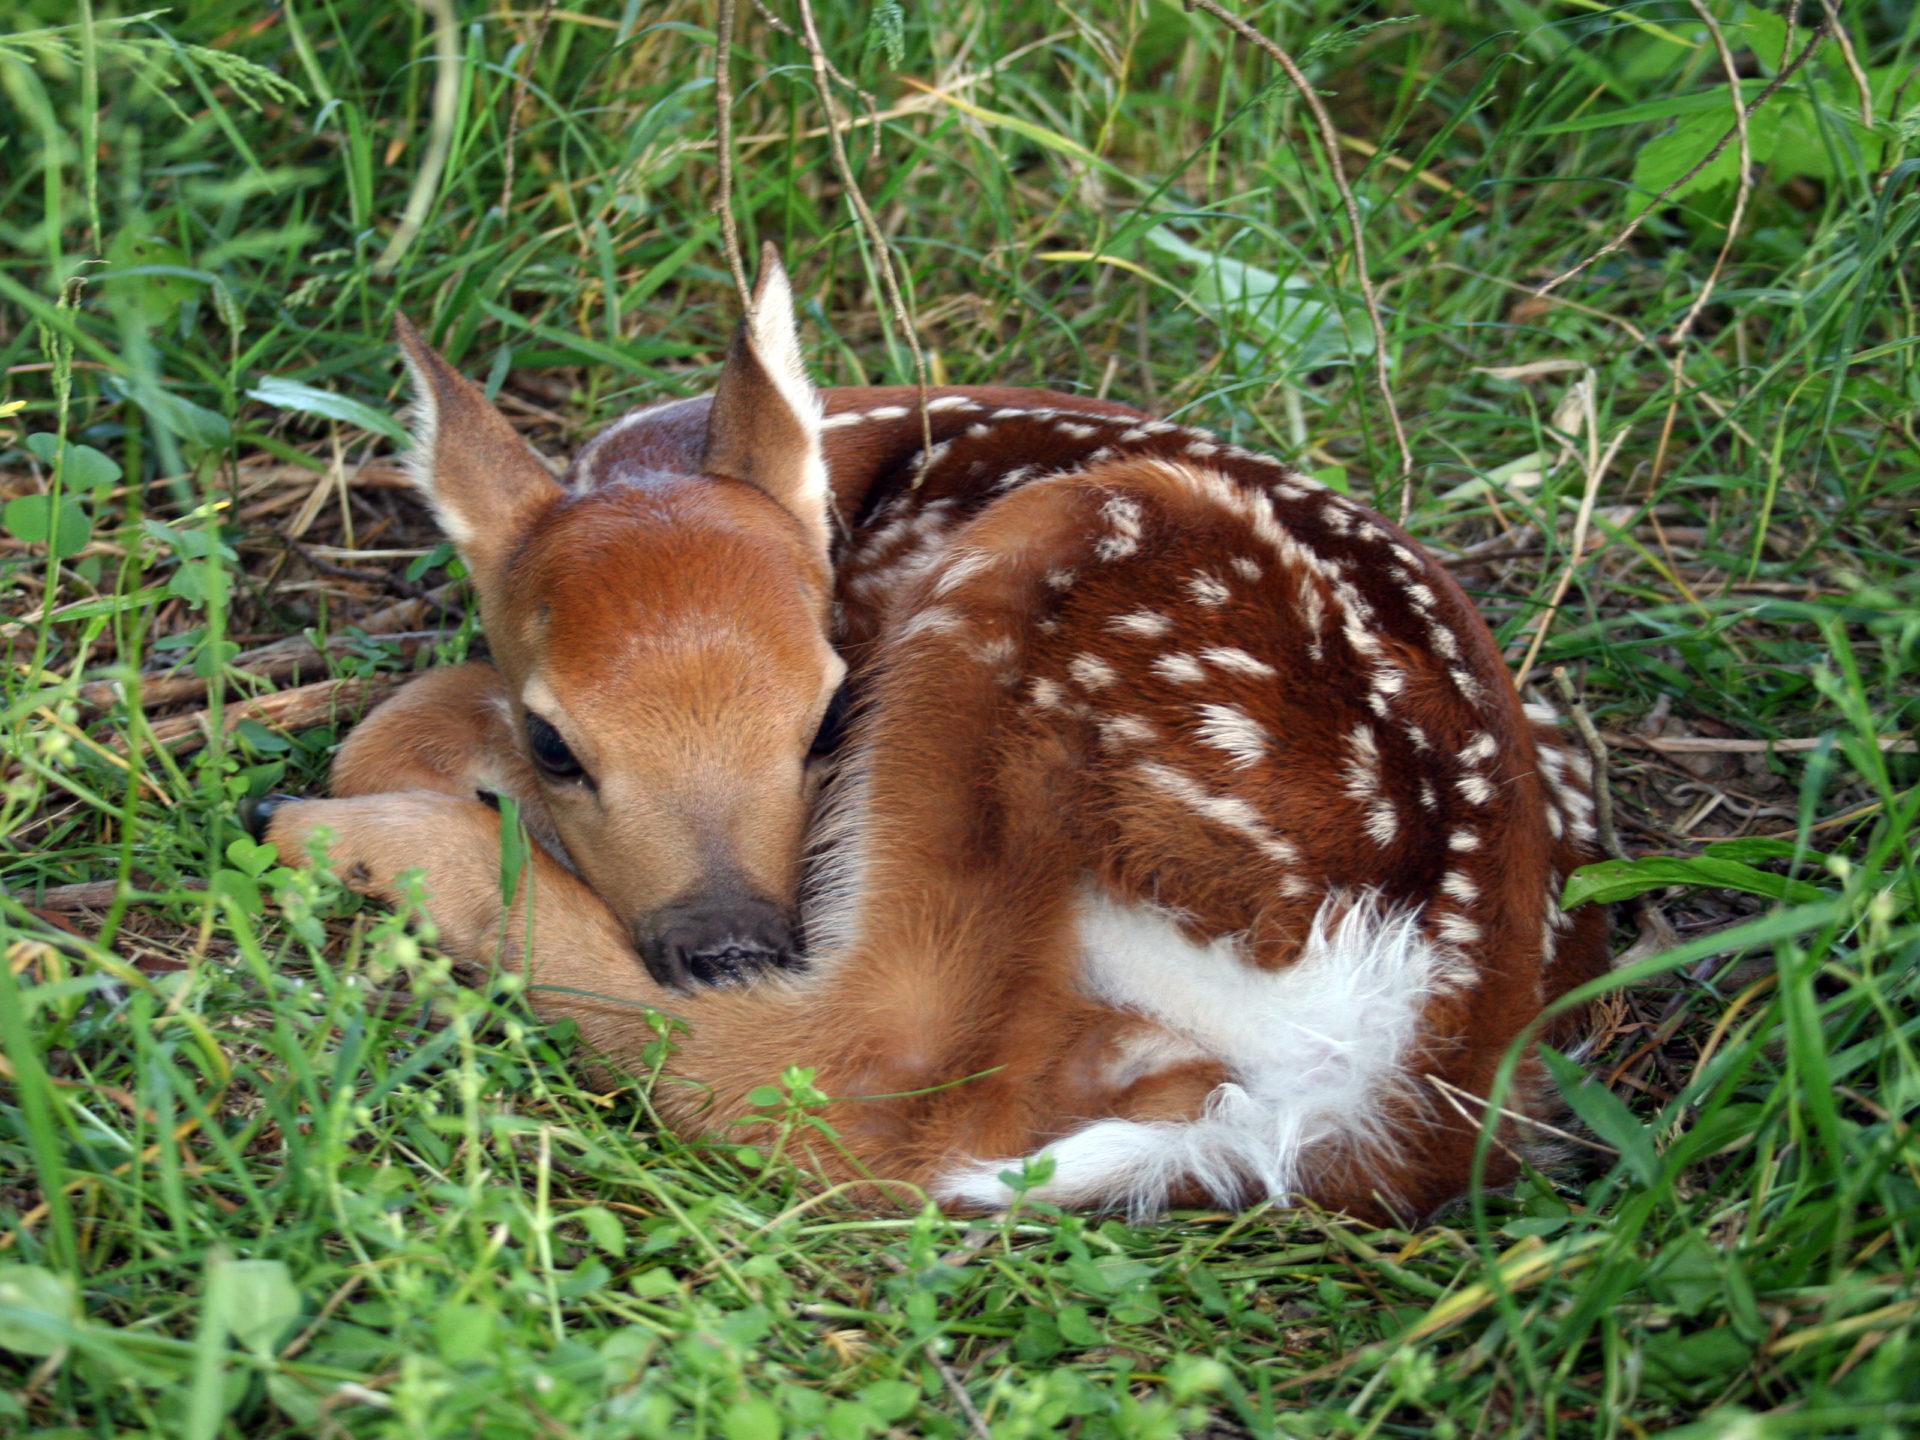 Cute Baby High Resolution Wallpapers Baby Deer Hd Wallpaper 59207 Wallpapers13 Com